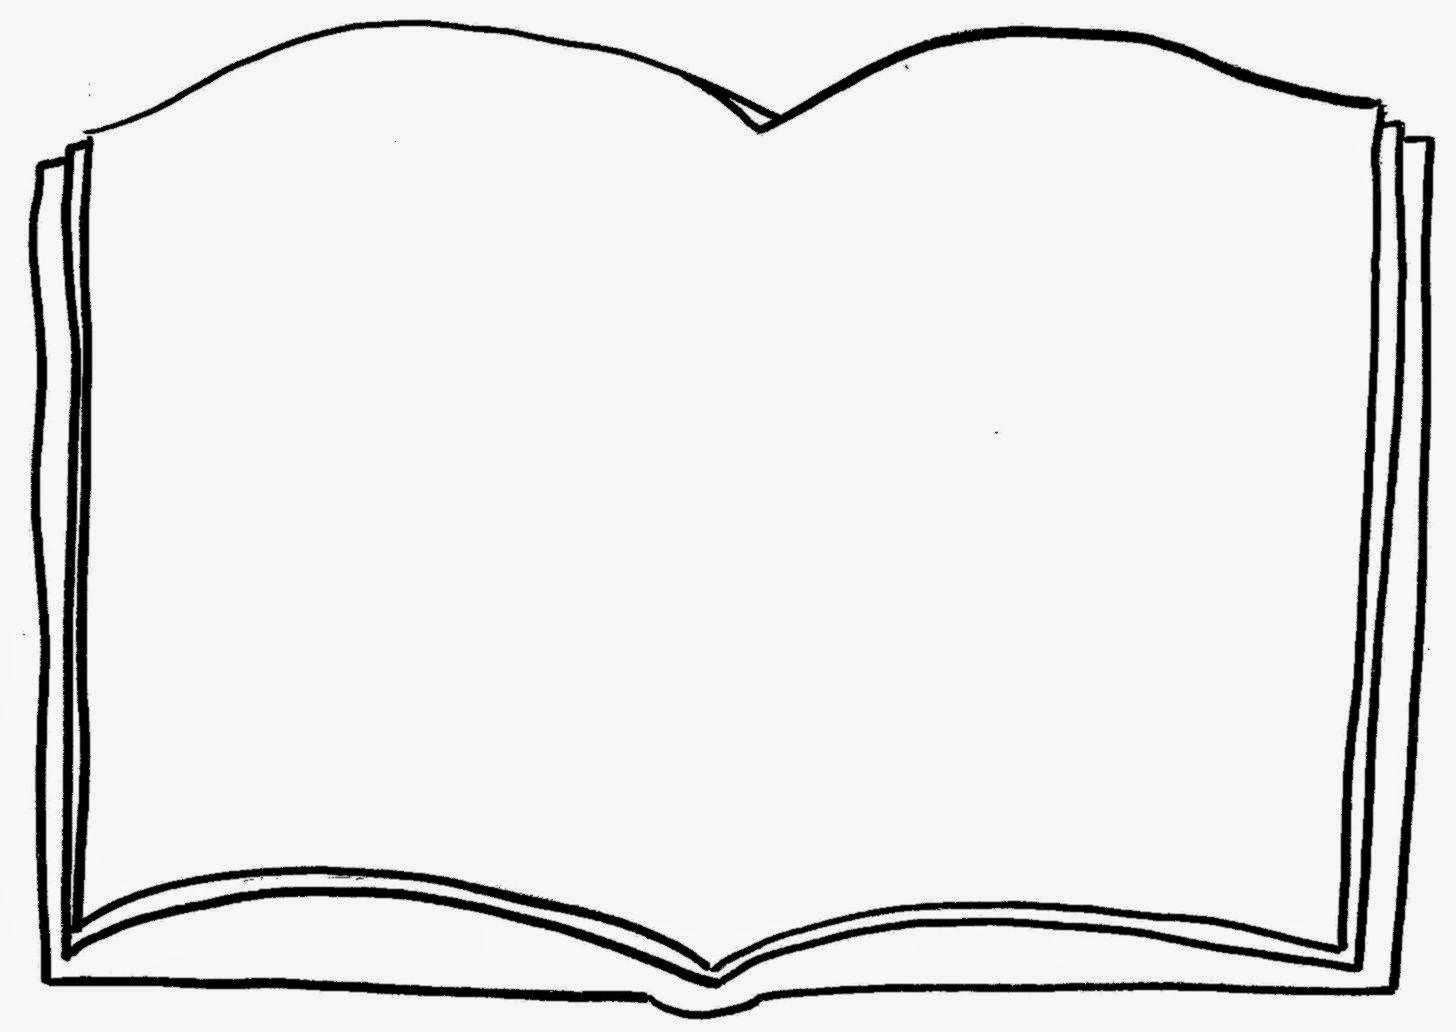 67 Free Open Book Clip Art